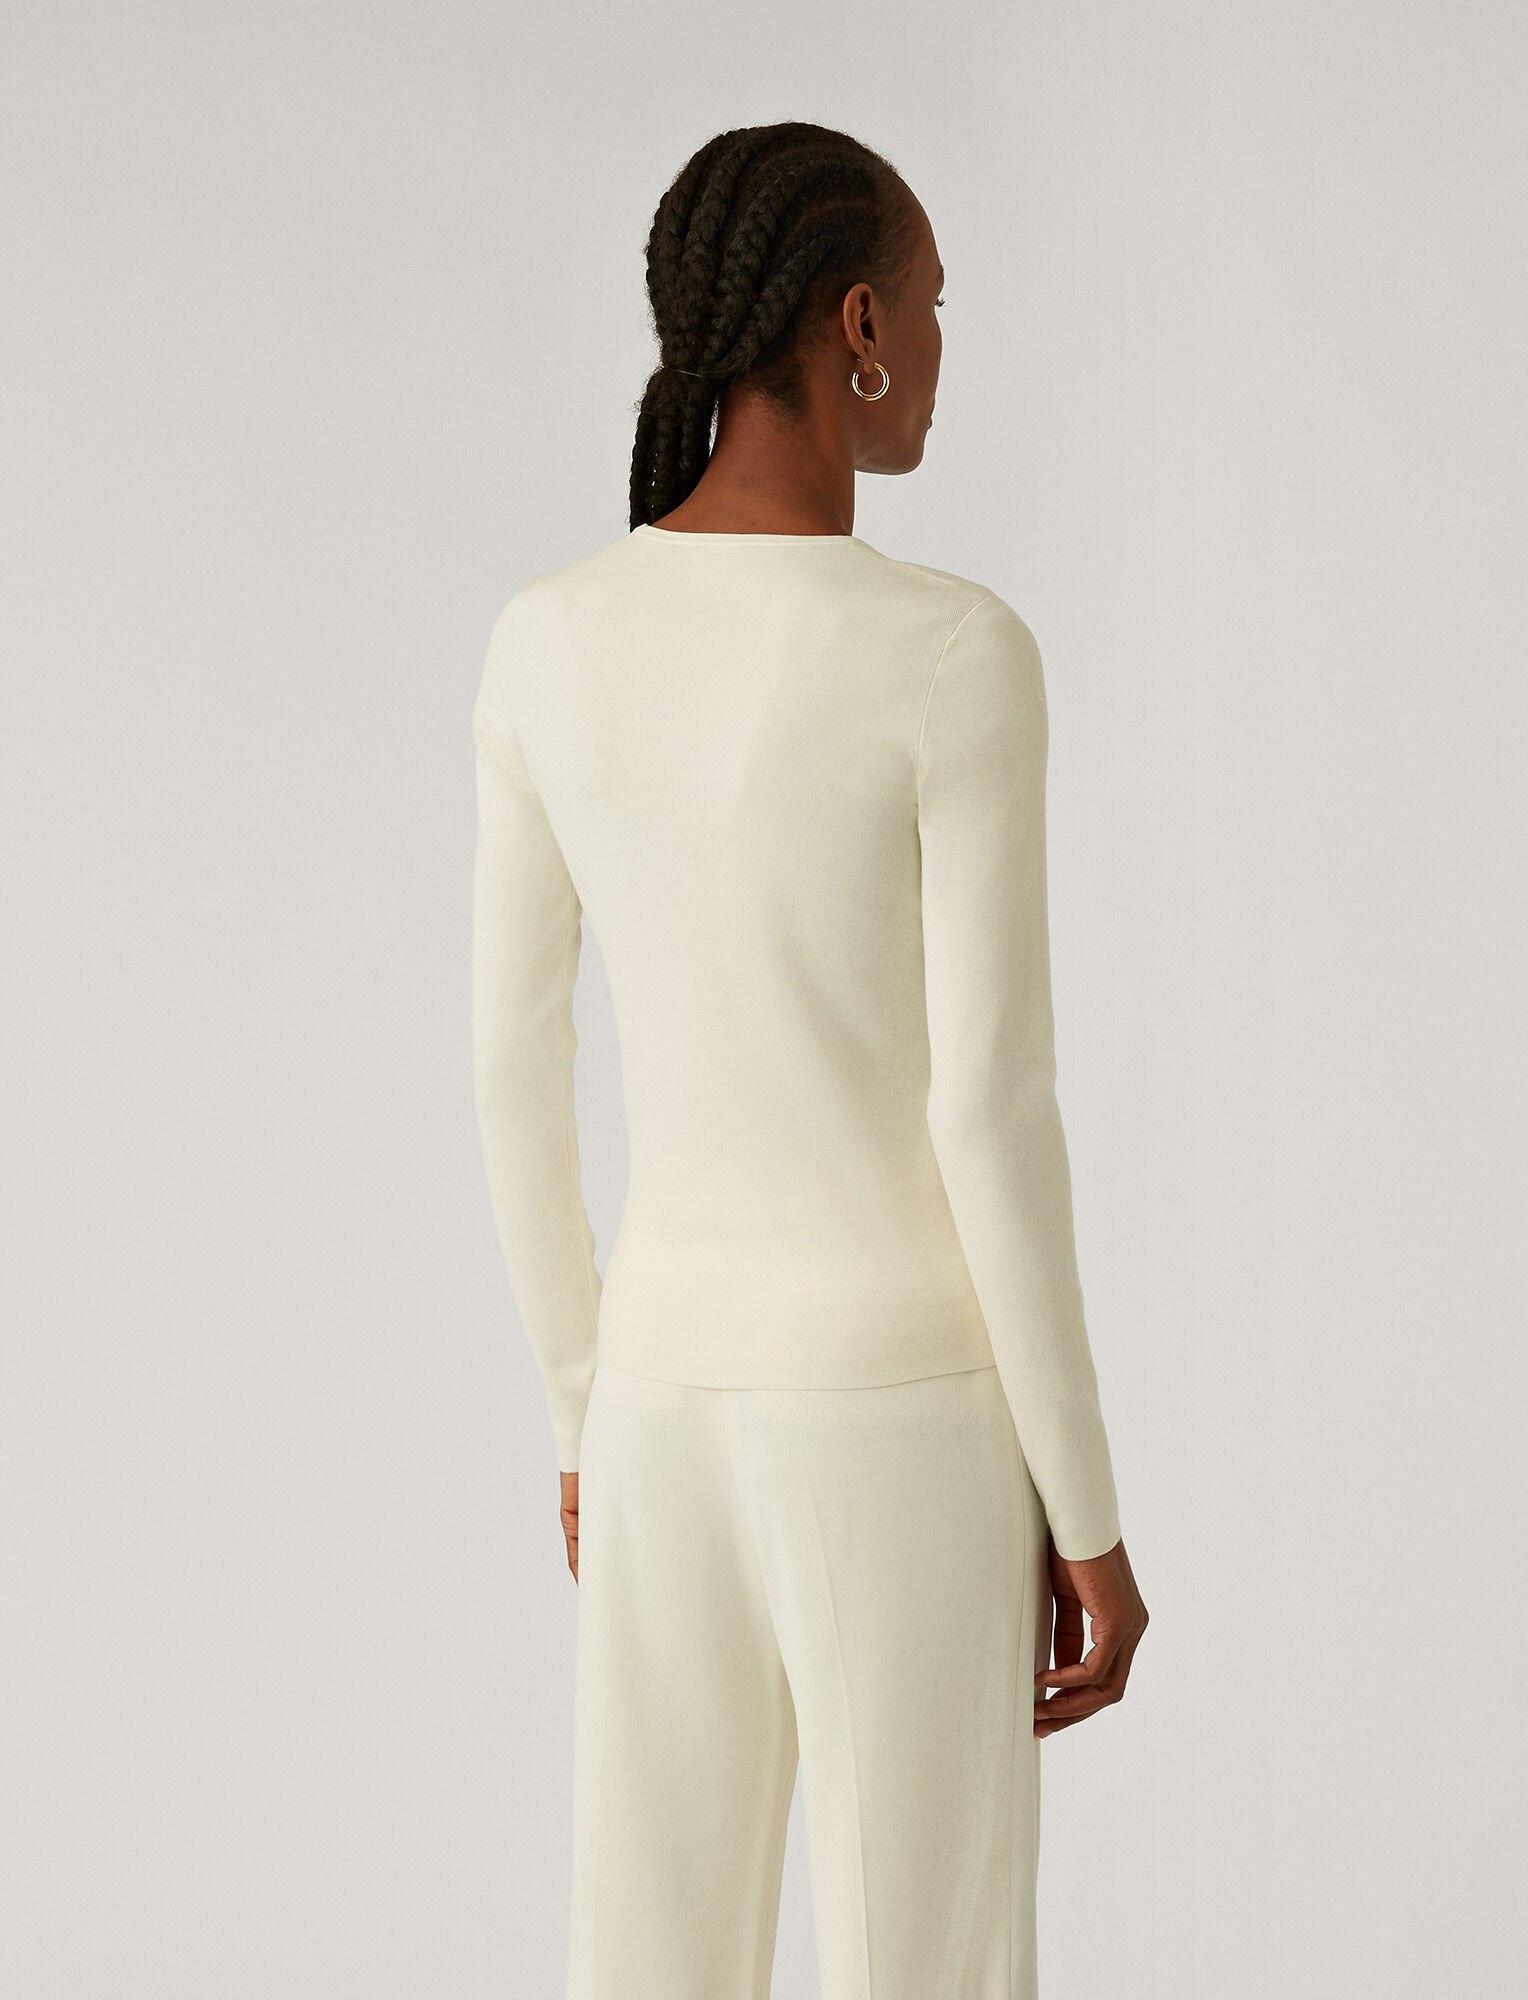 Rd Nk Ls Silk Stretch Top Ivory